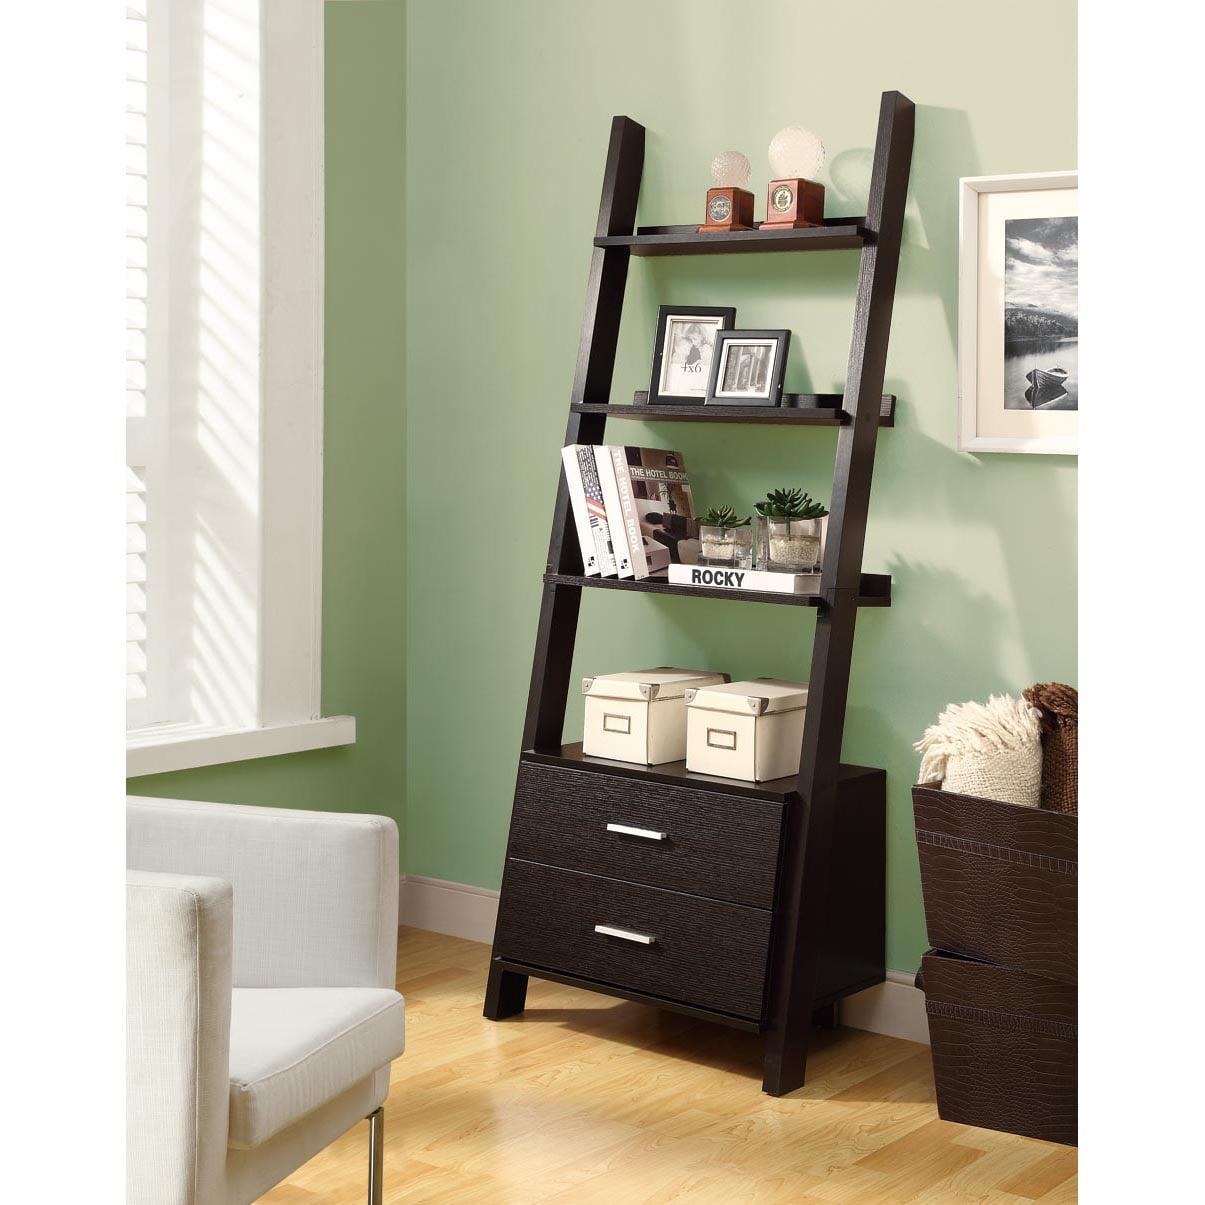 Buy Leaning Bookshelves Bookcases Online At Overstock